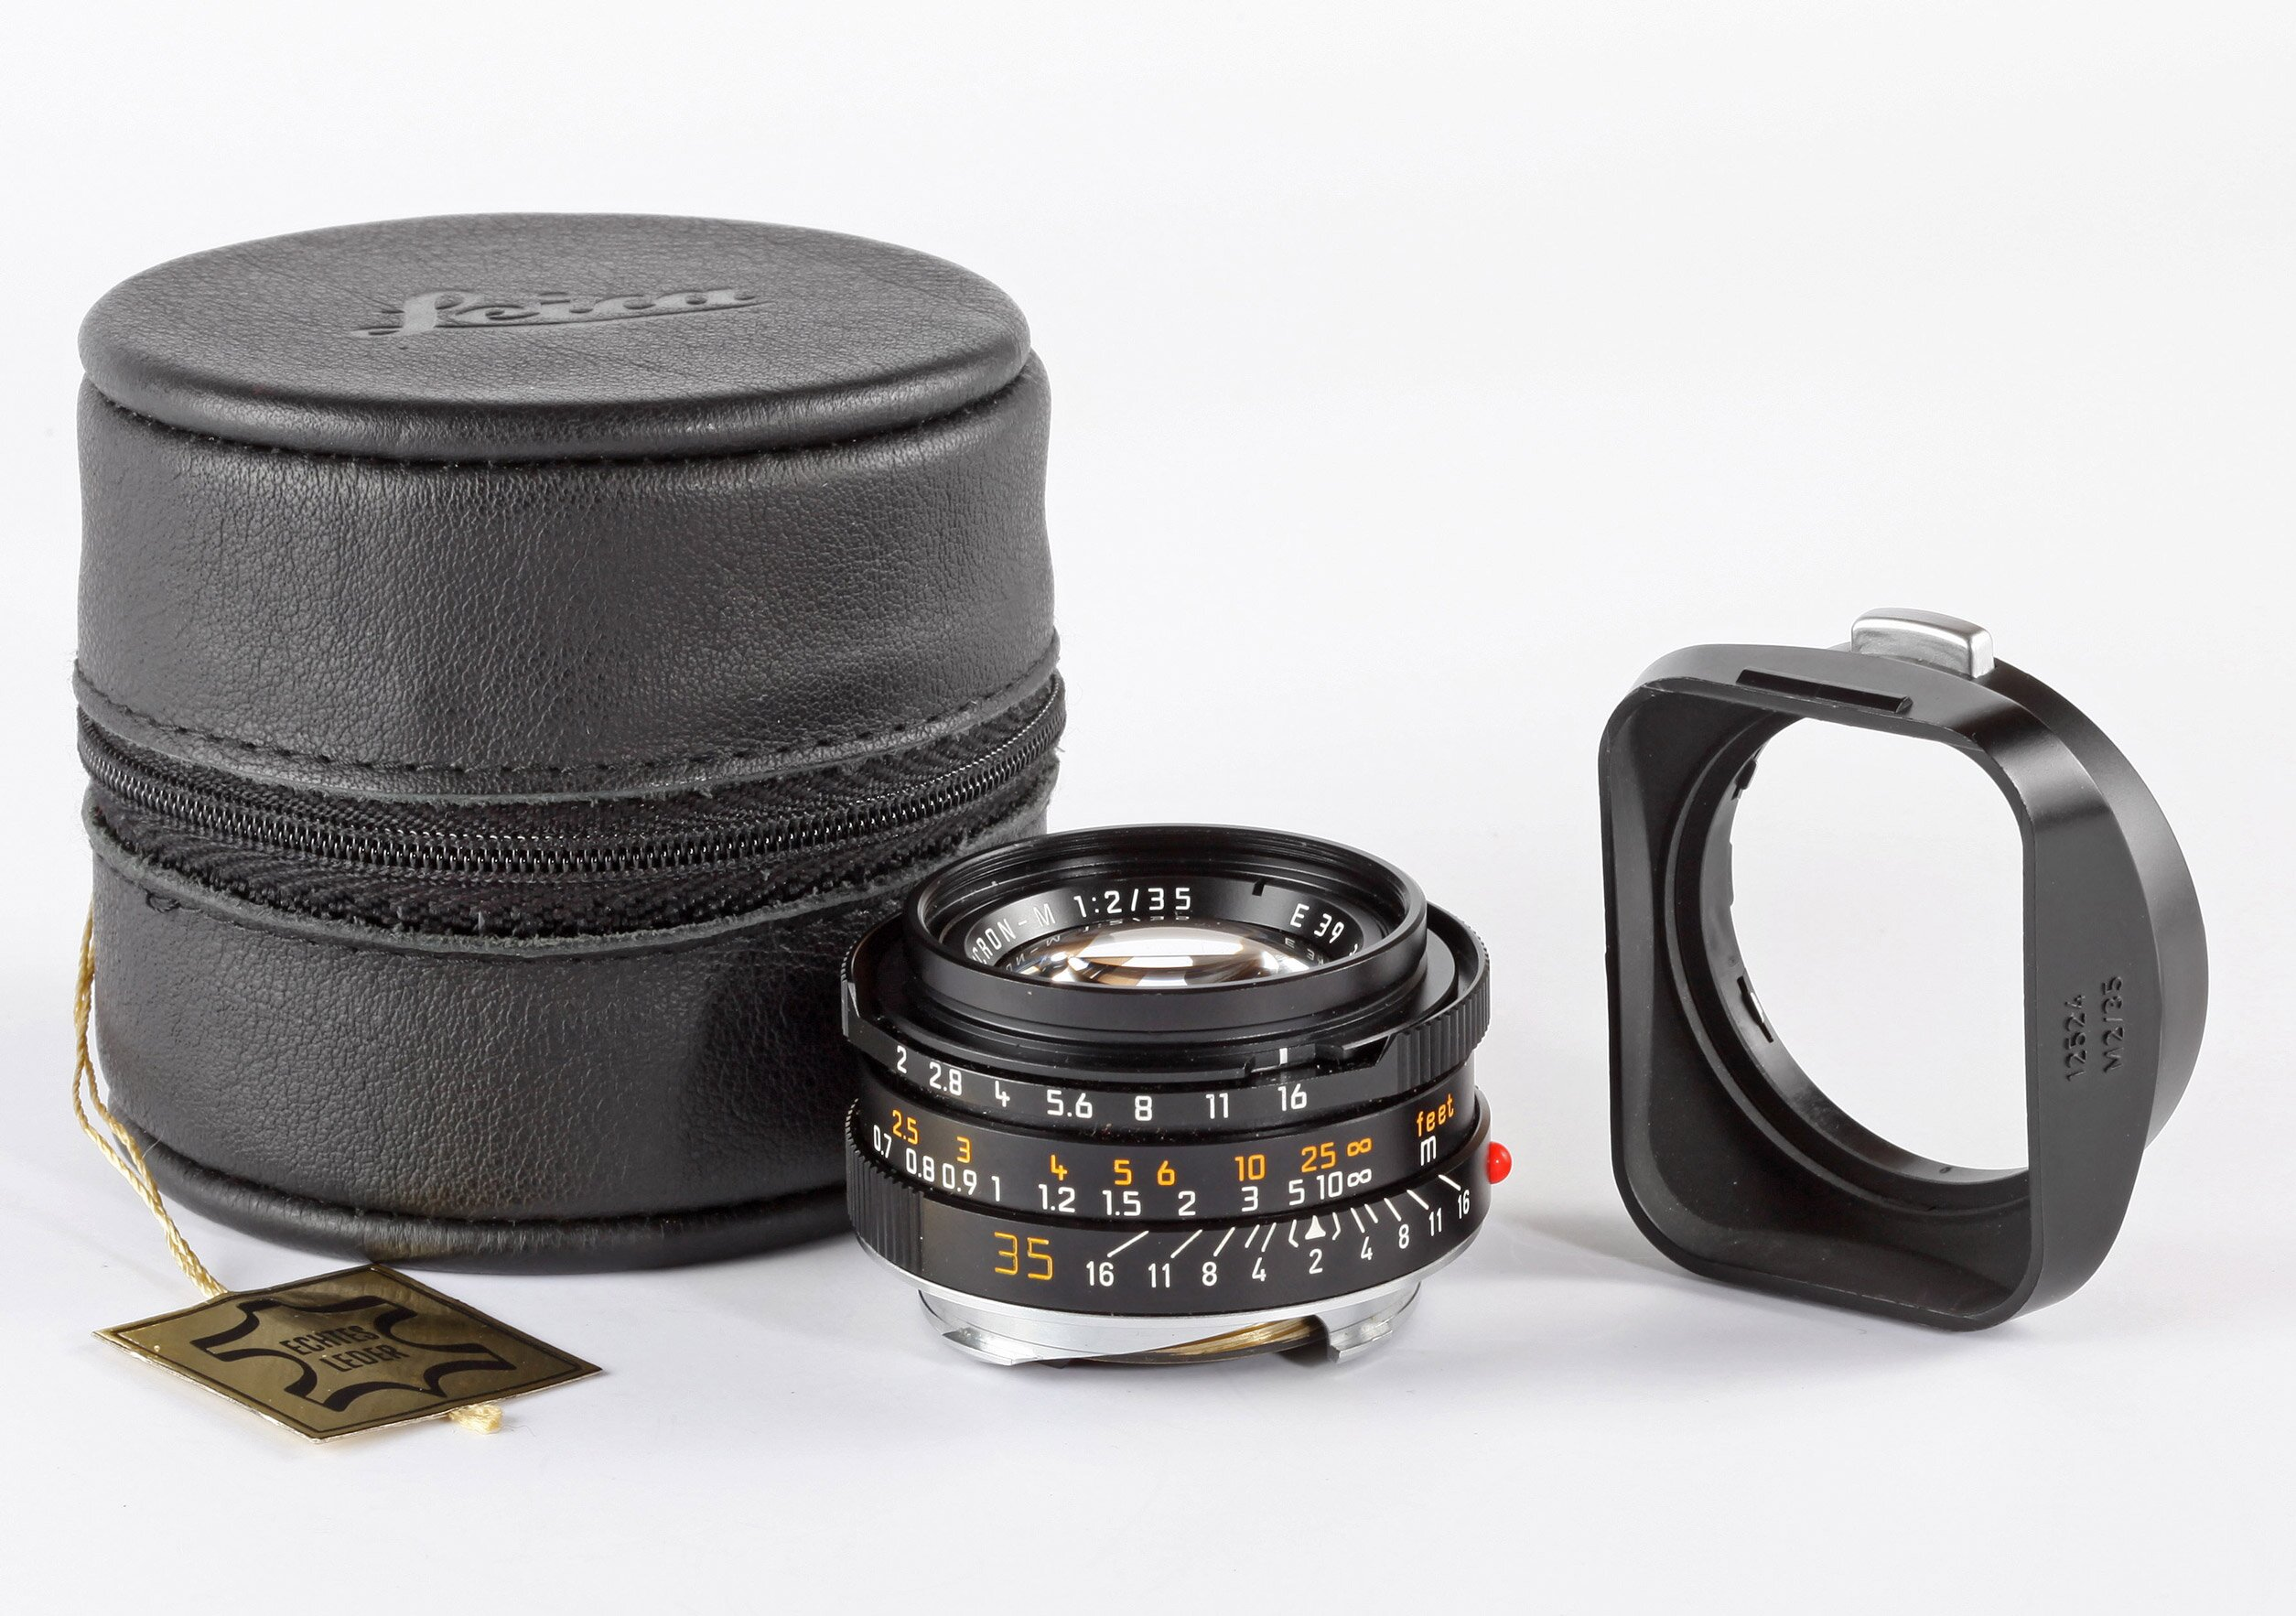 Leica M 35mm 2 Summicron-M E39 Germany